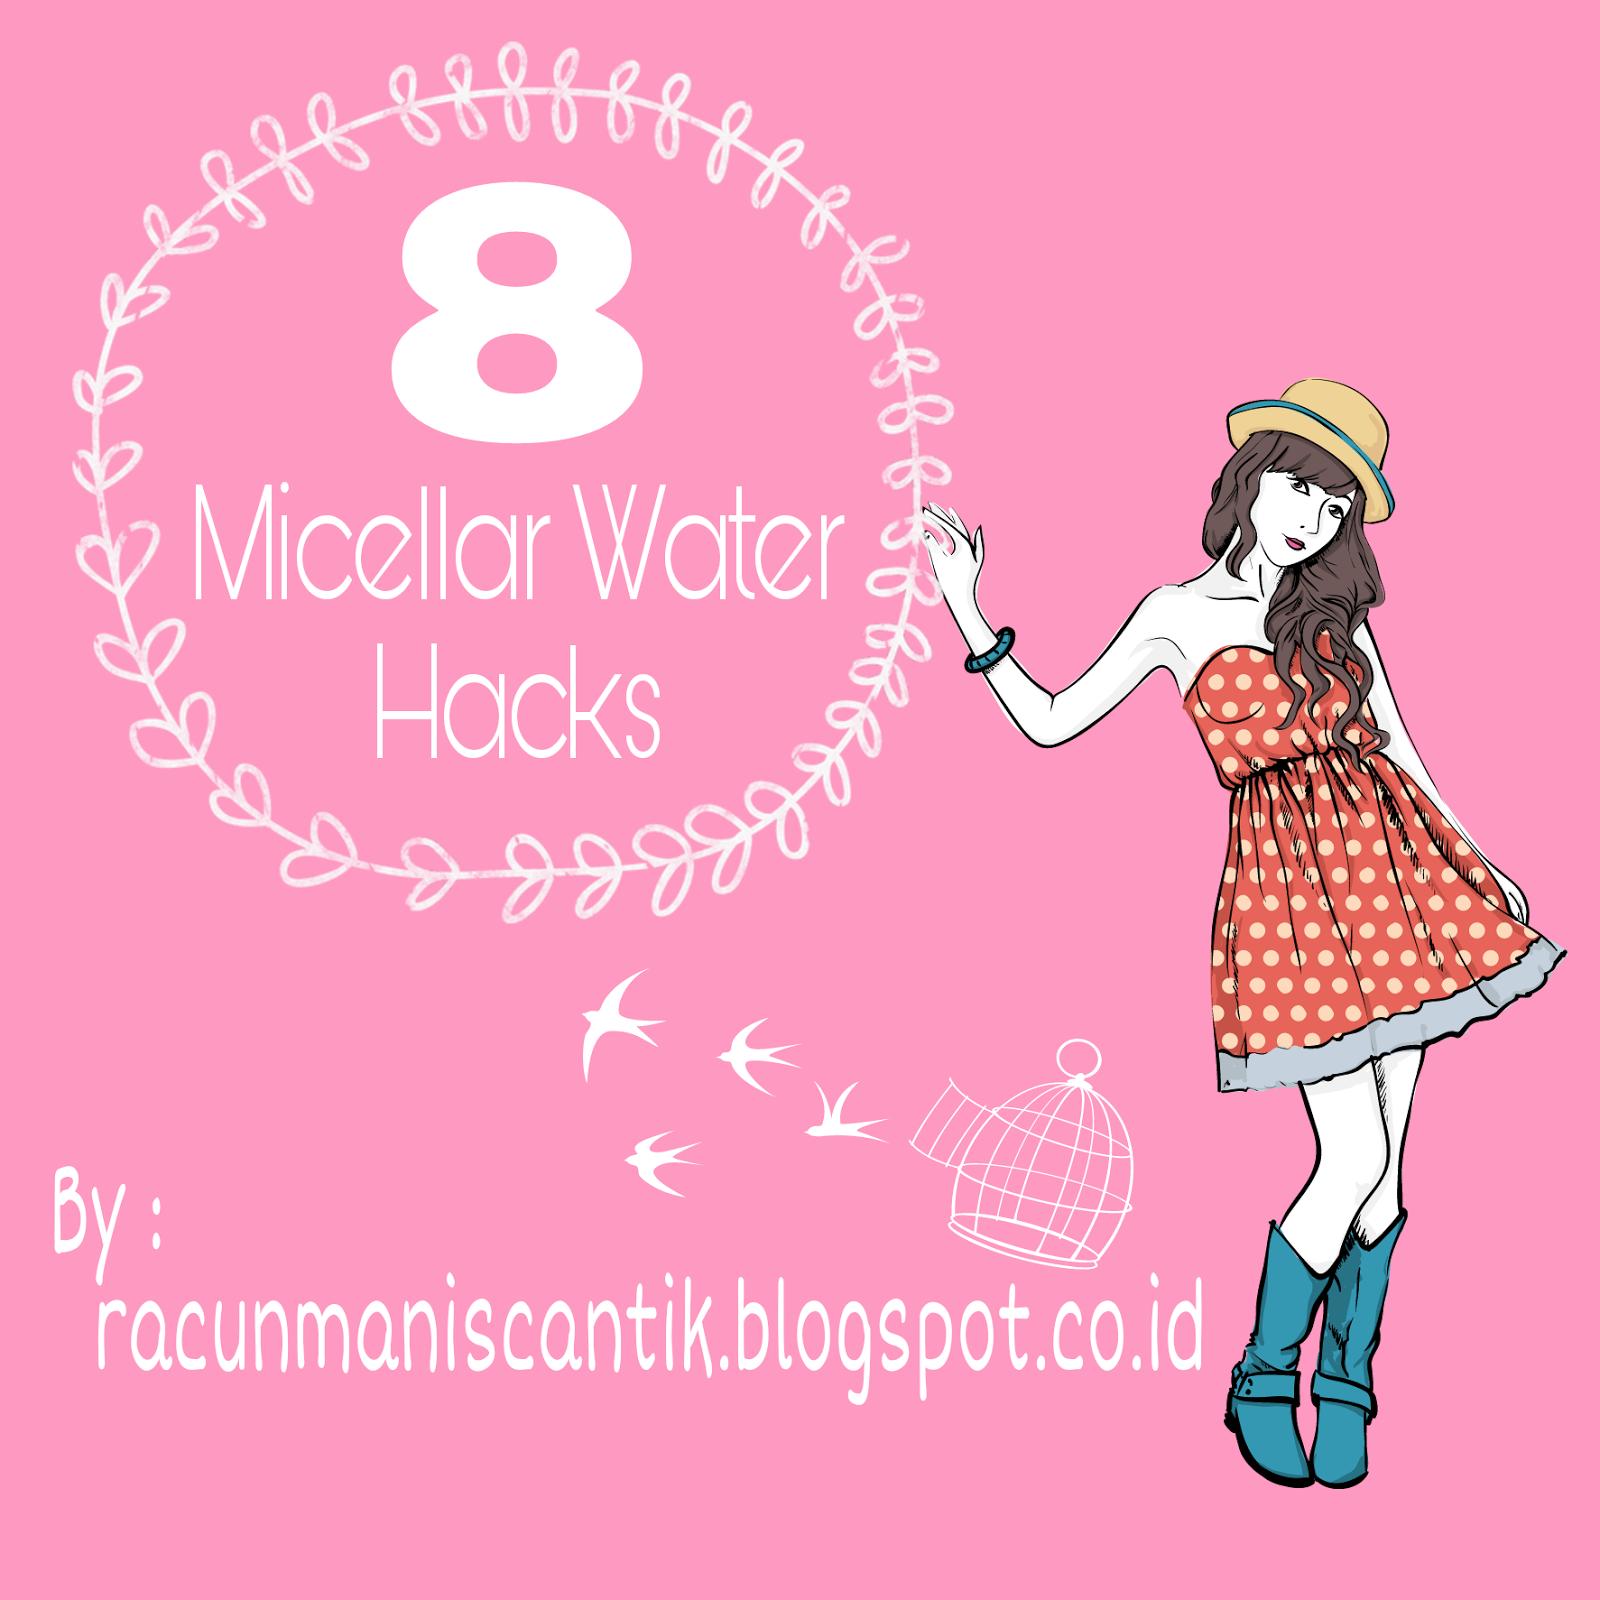 Beauty hacks 101 8 Fungsi Lain Micellar Water yang Jarang Cewek Tau